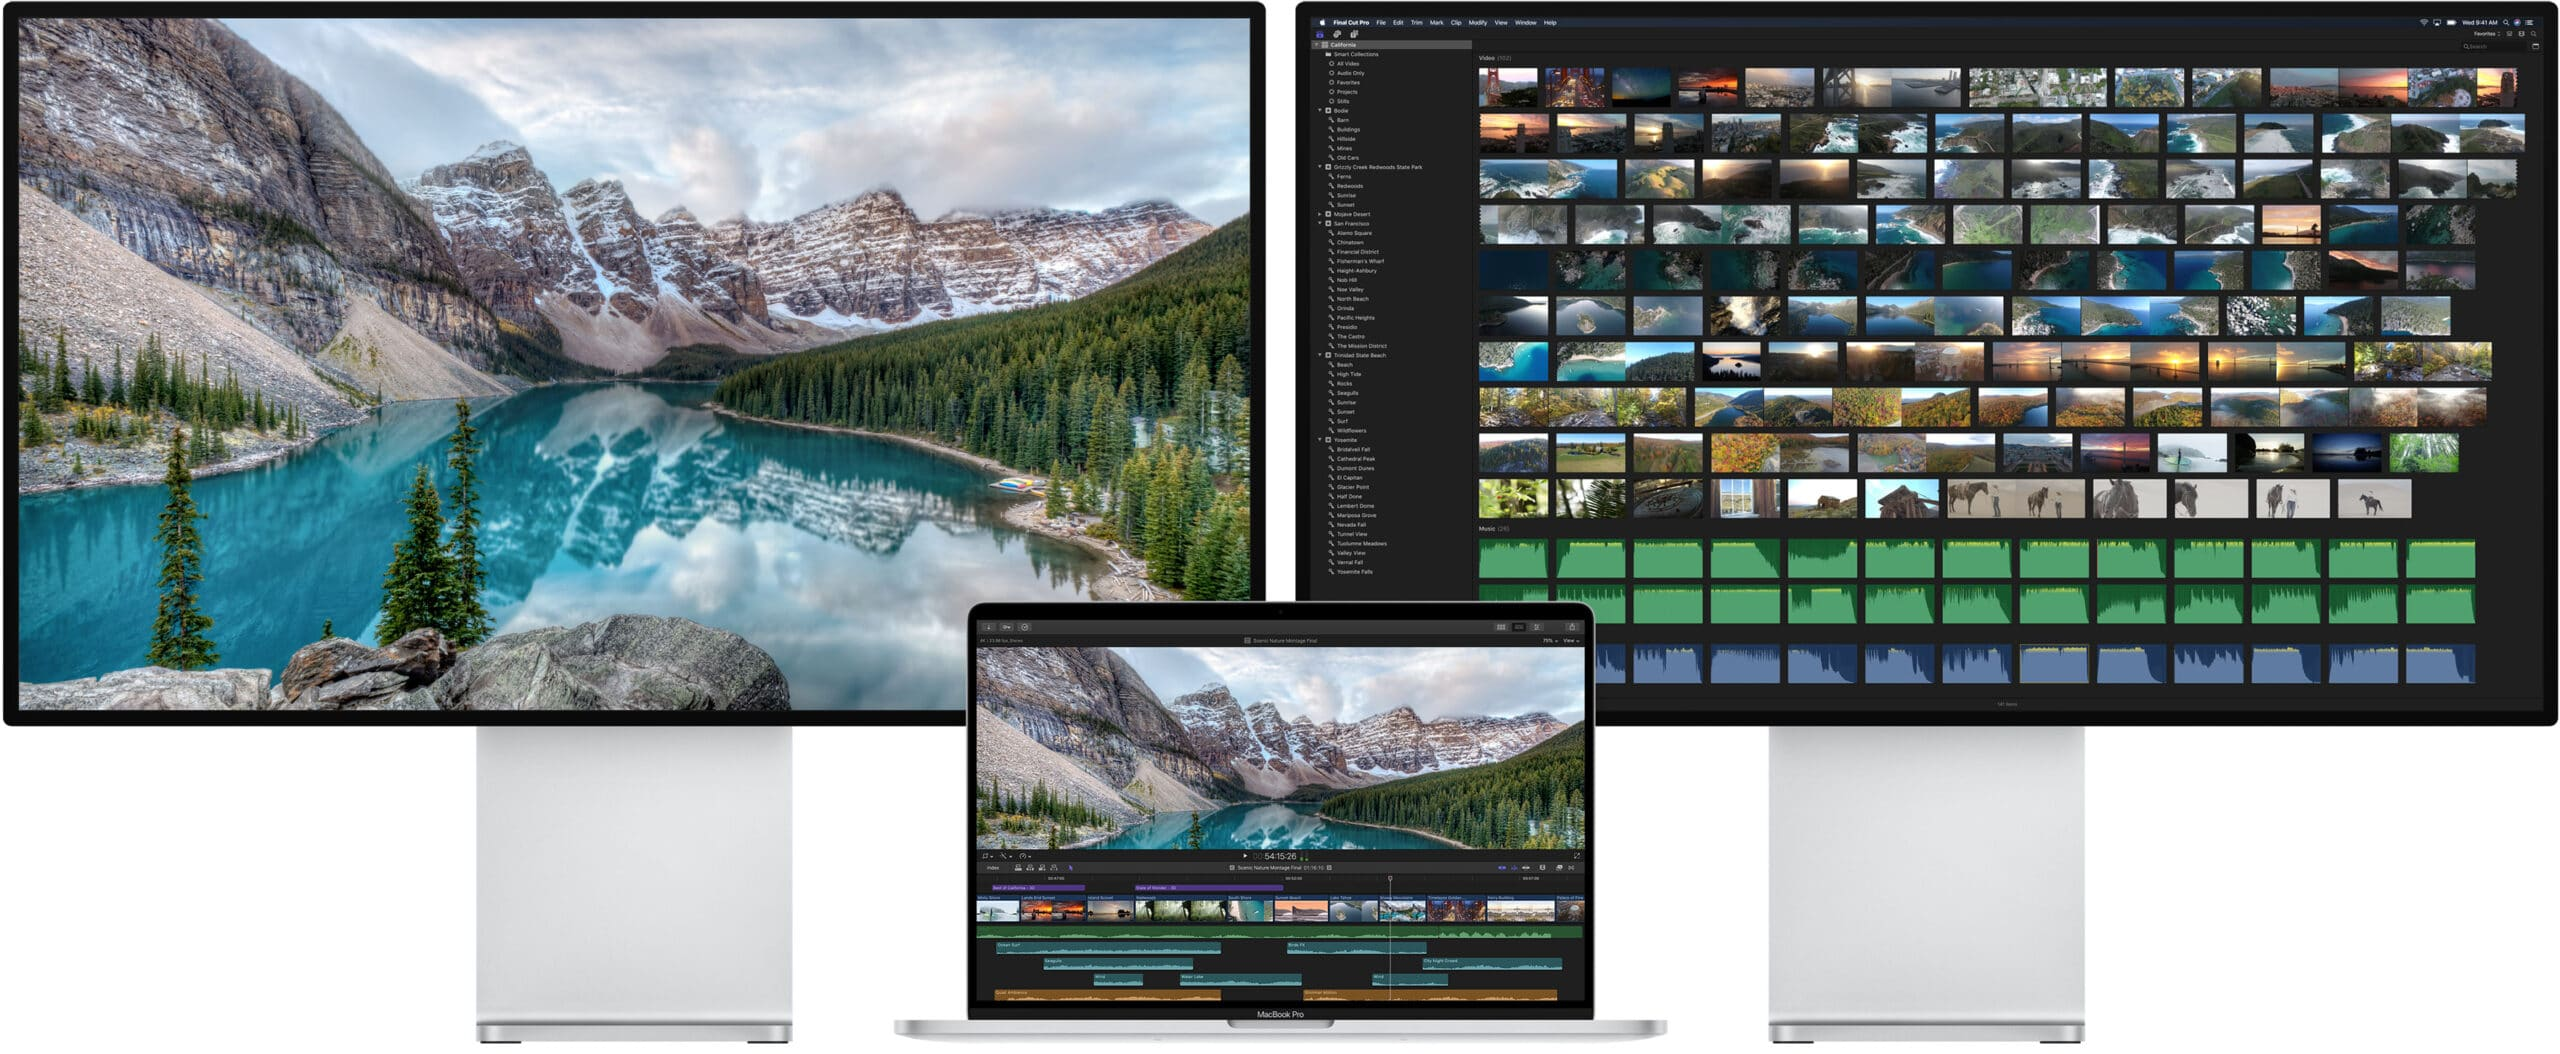 MacBook Pro e Pro Display XDR